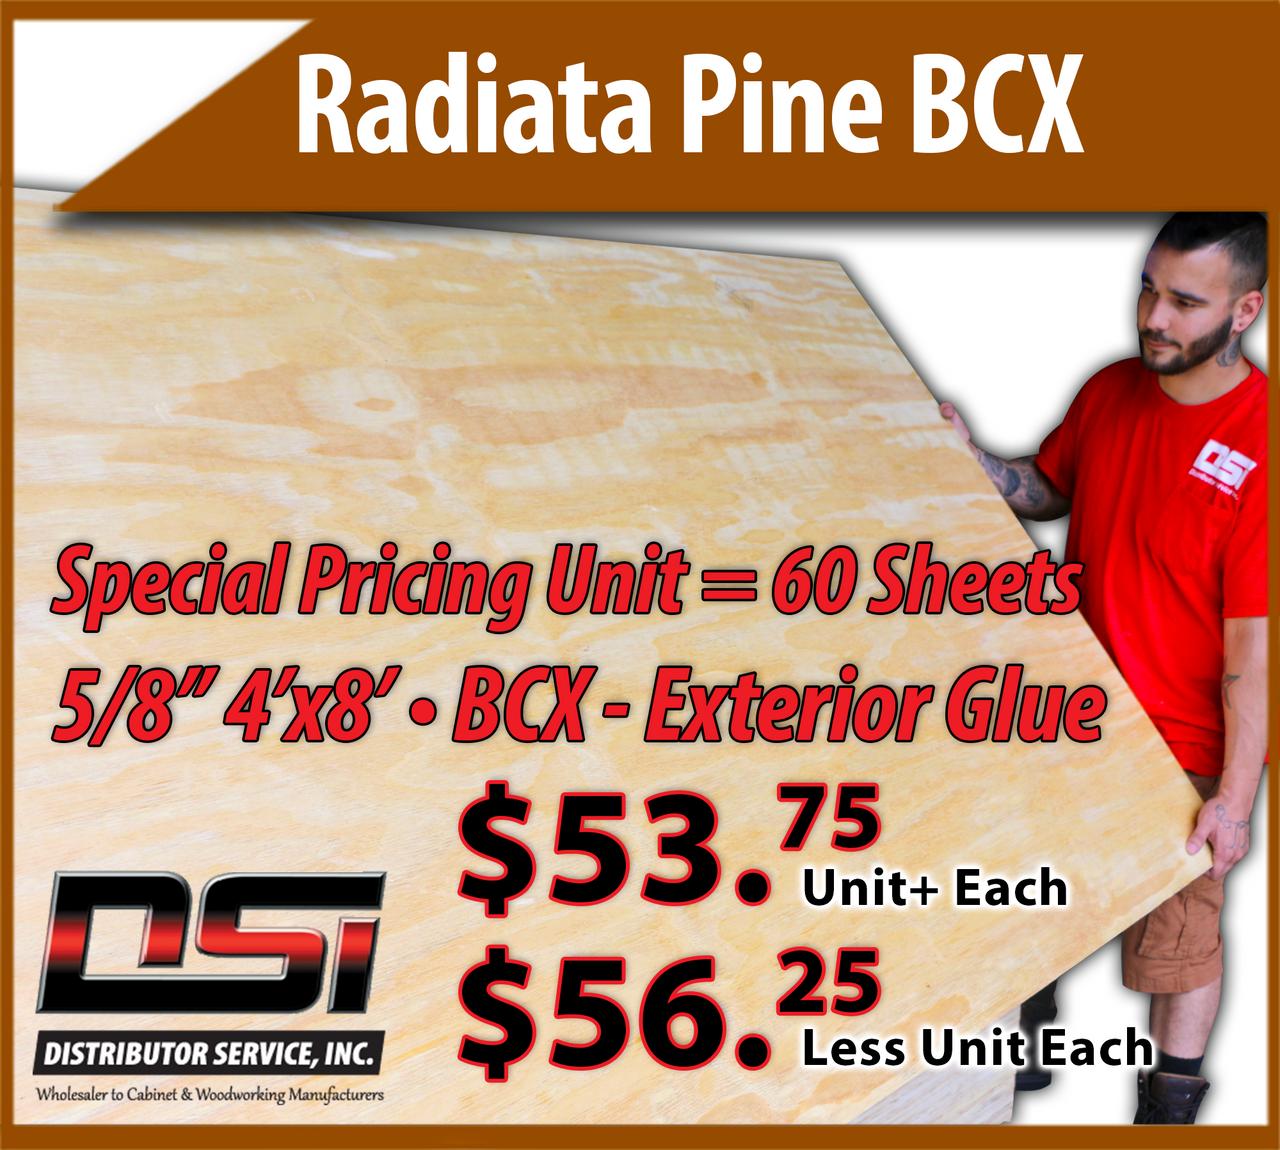 Radiata Pine Plywood 5-8 15mm 4x8 BCX - Exterior Glue RADP58BC